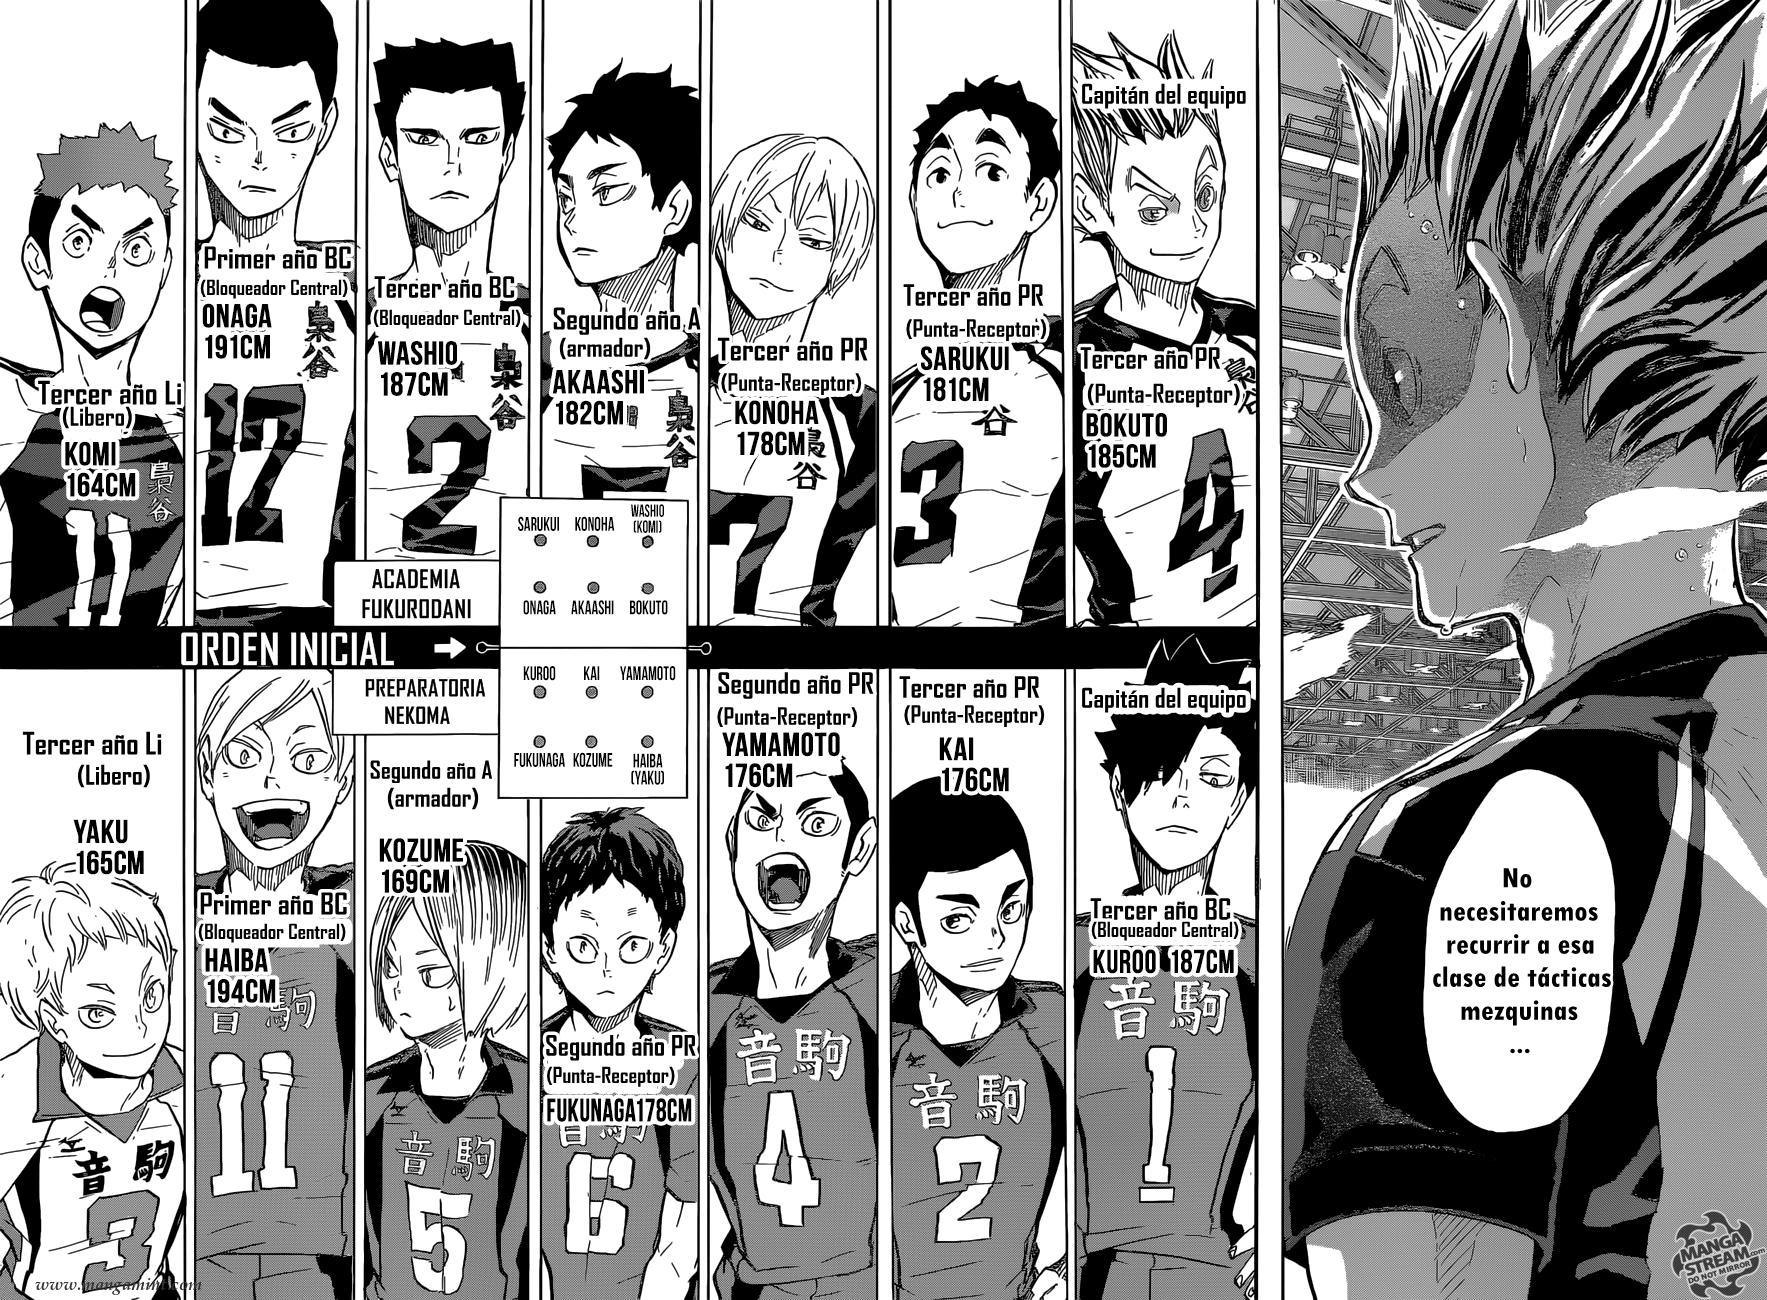 http://c5.ninemanga.com/es_manga/10/10/440055/e2701537f72184bb152aa9d26a93ecca.jpg Page 7